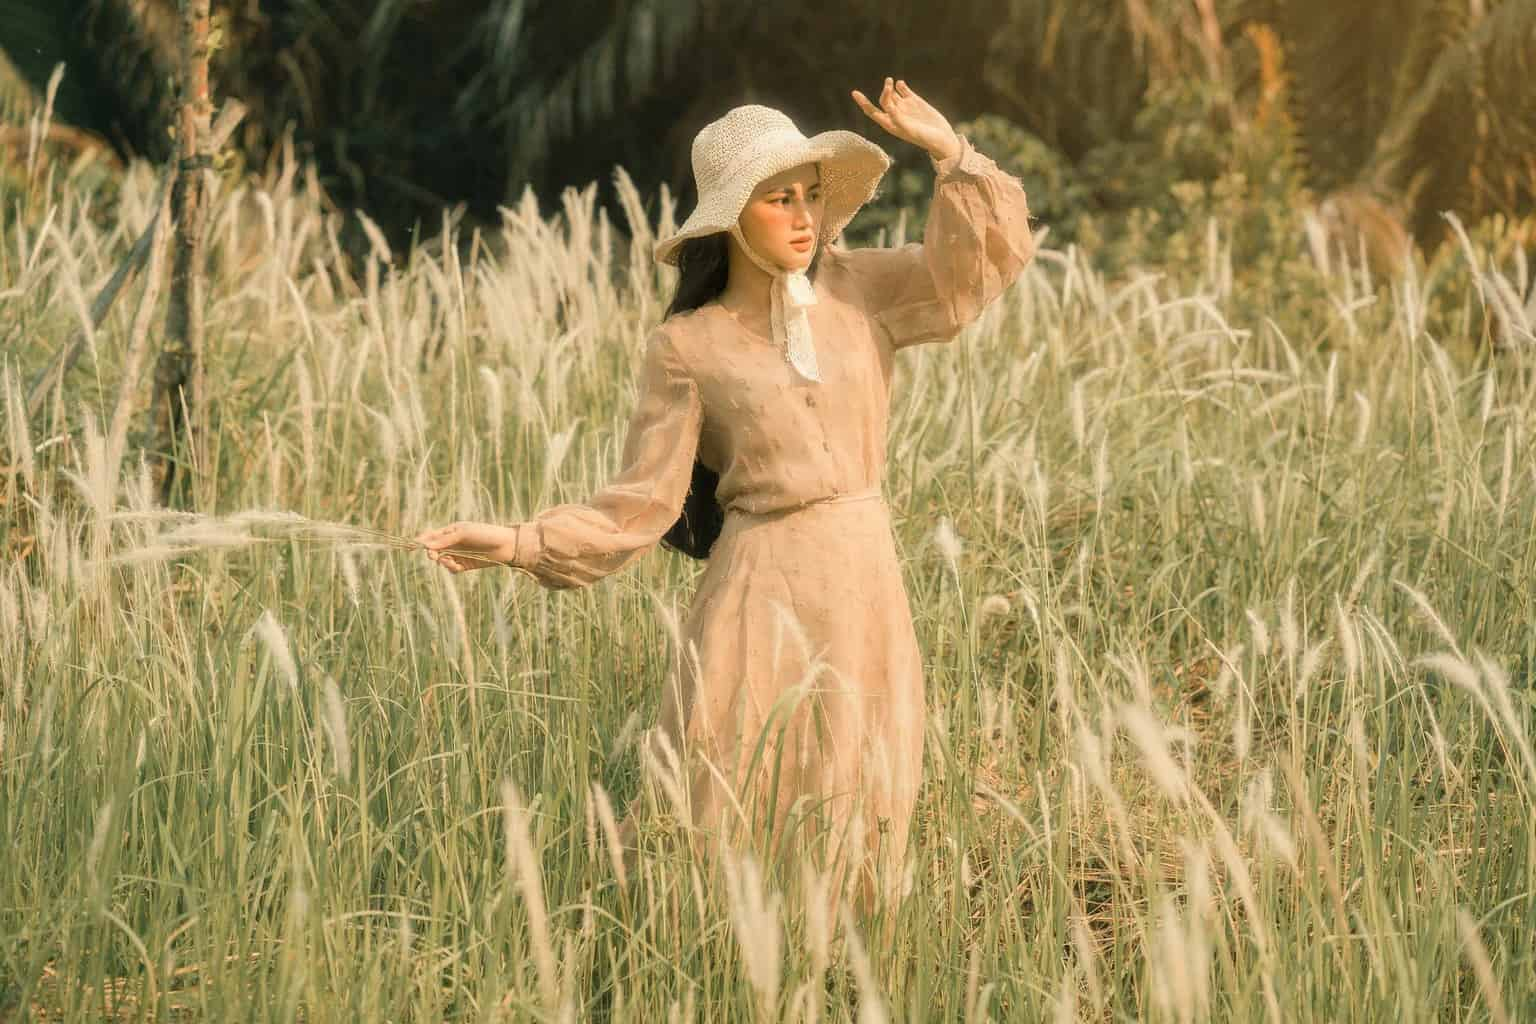 woman in hat among grass in field